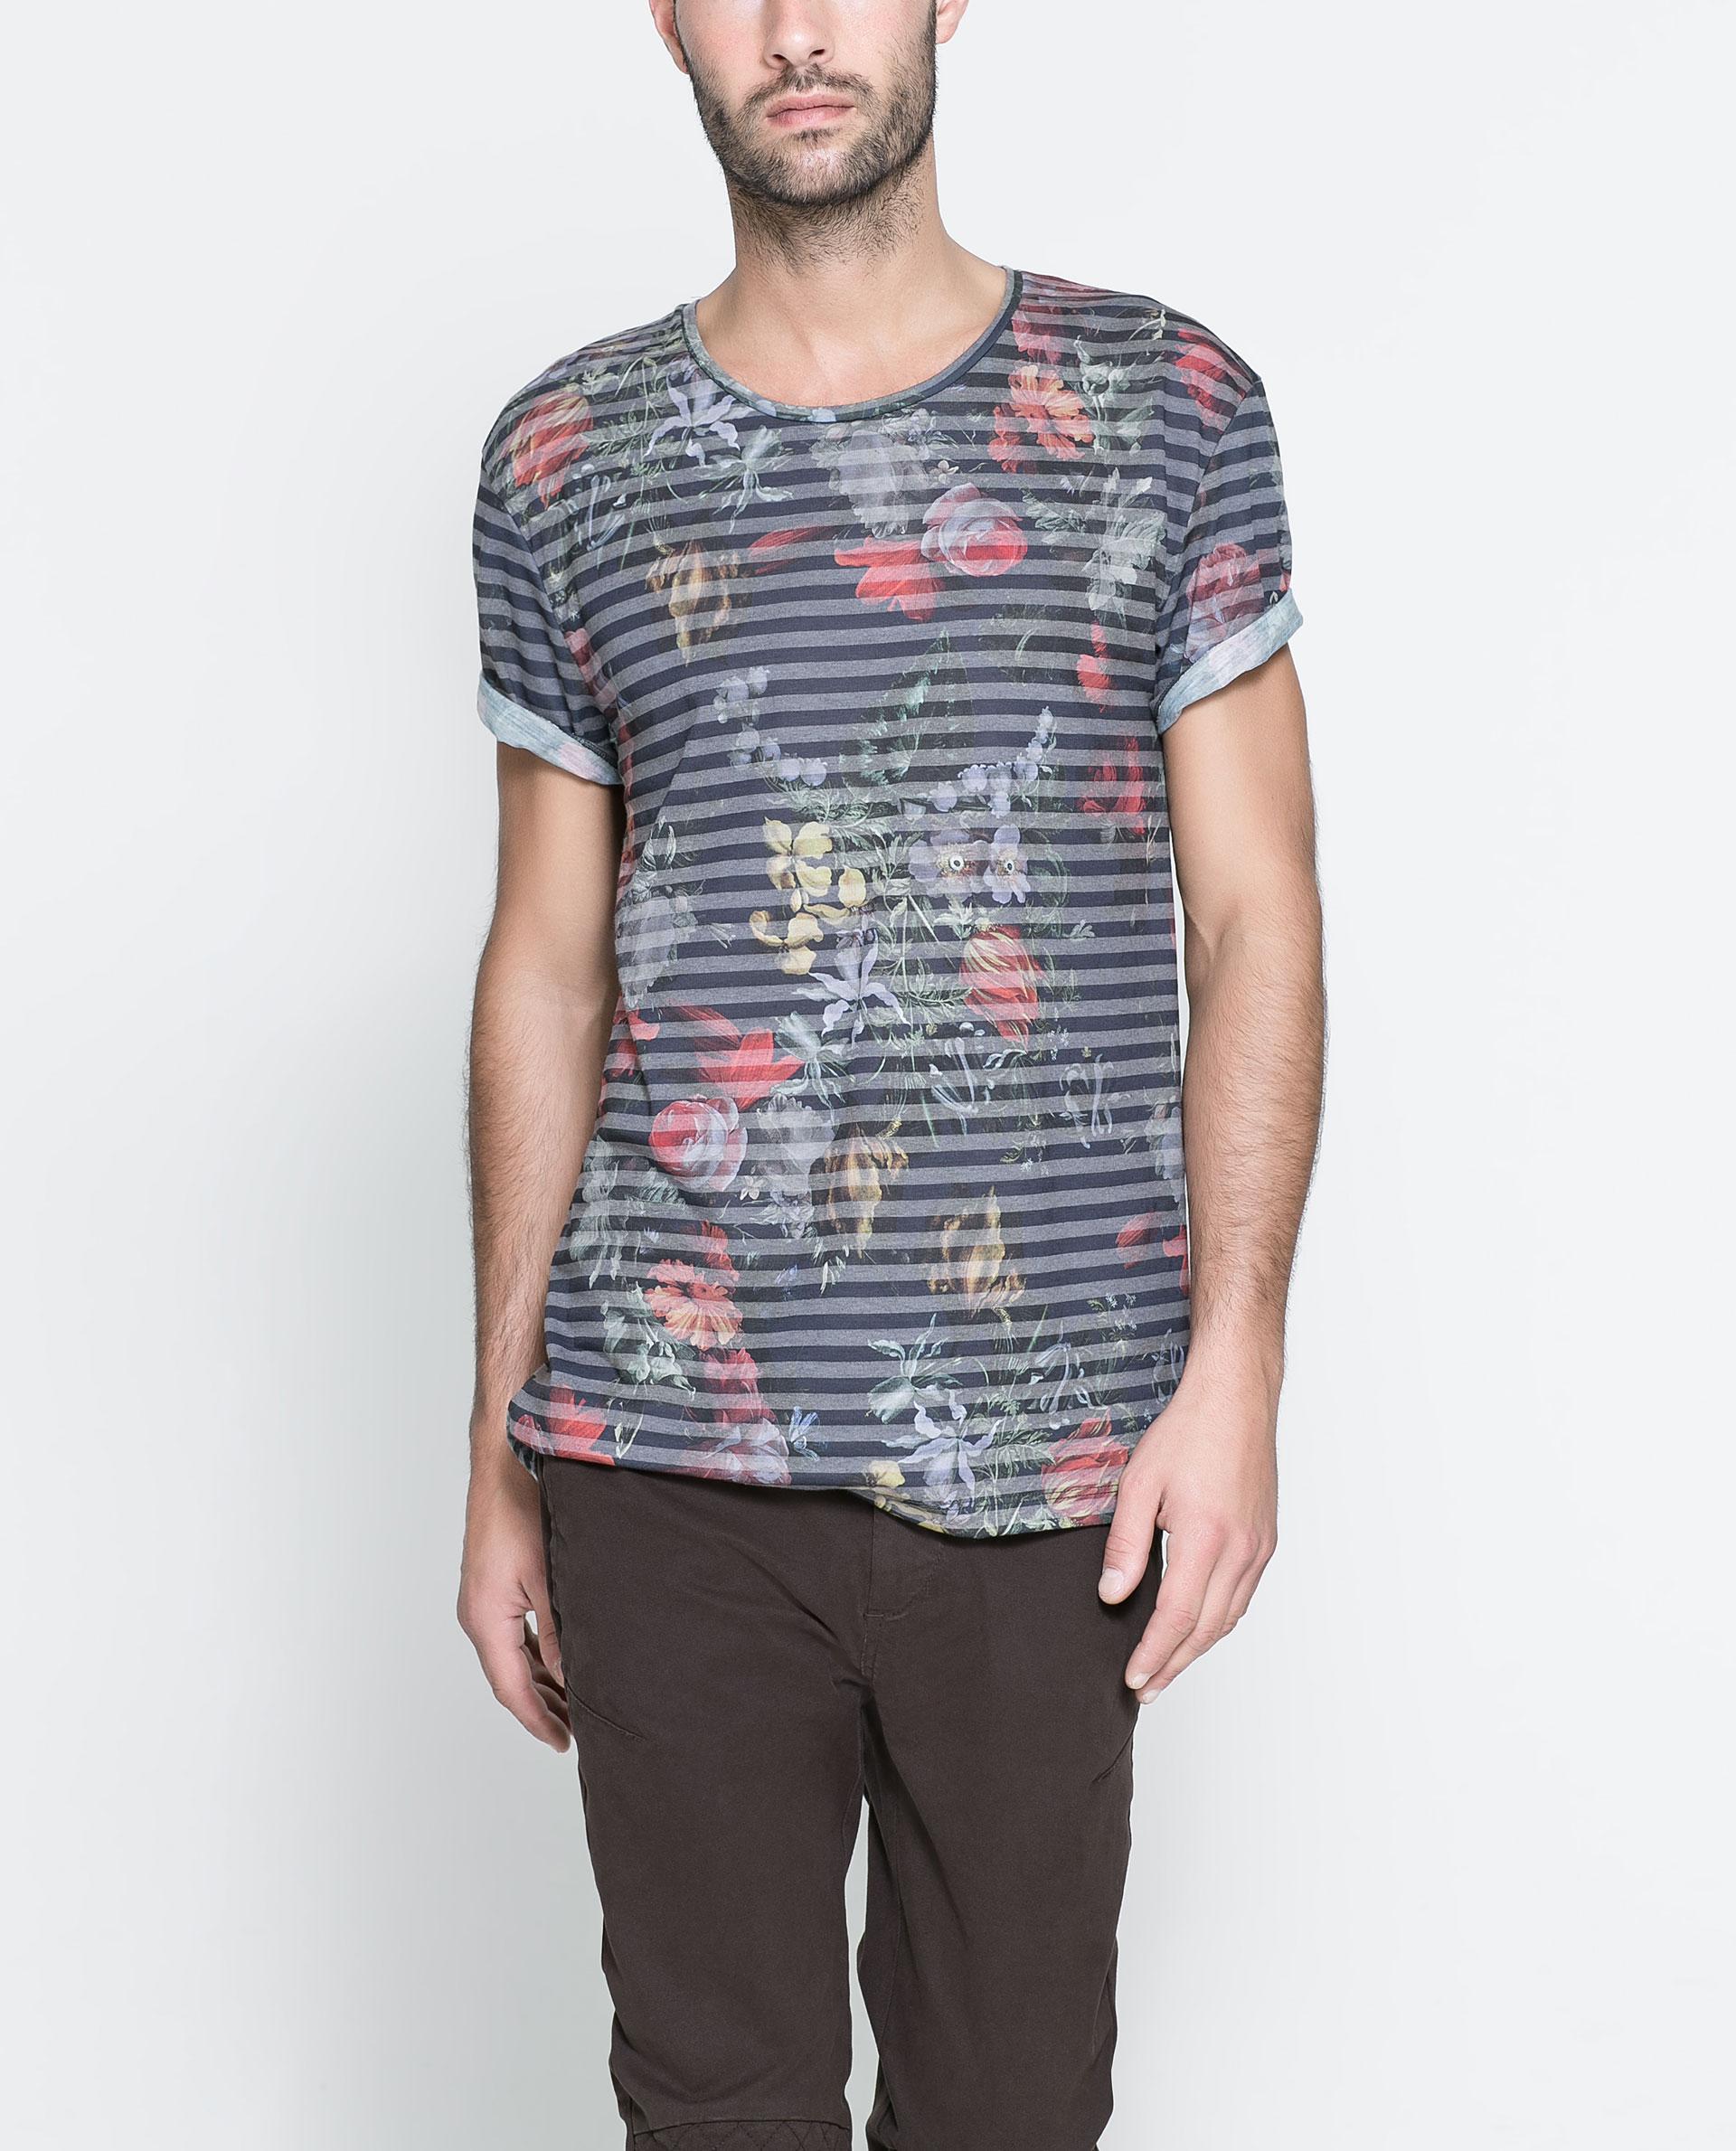 Zara short sleeve t shirt in floral for men dark blue for Zara mens floral shirt